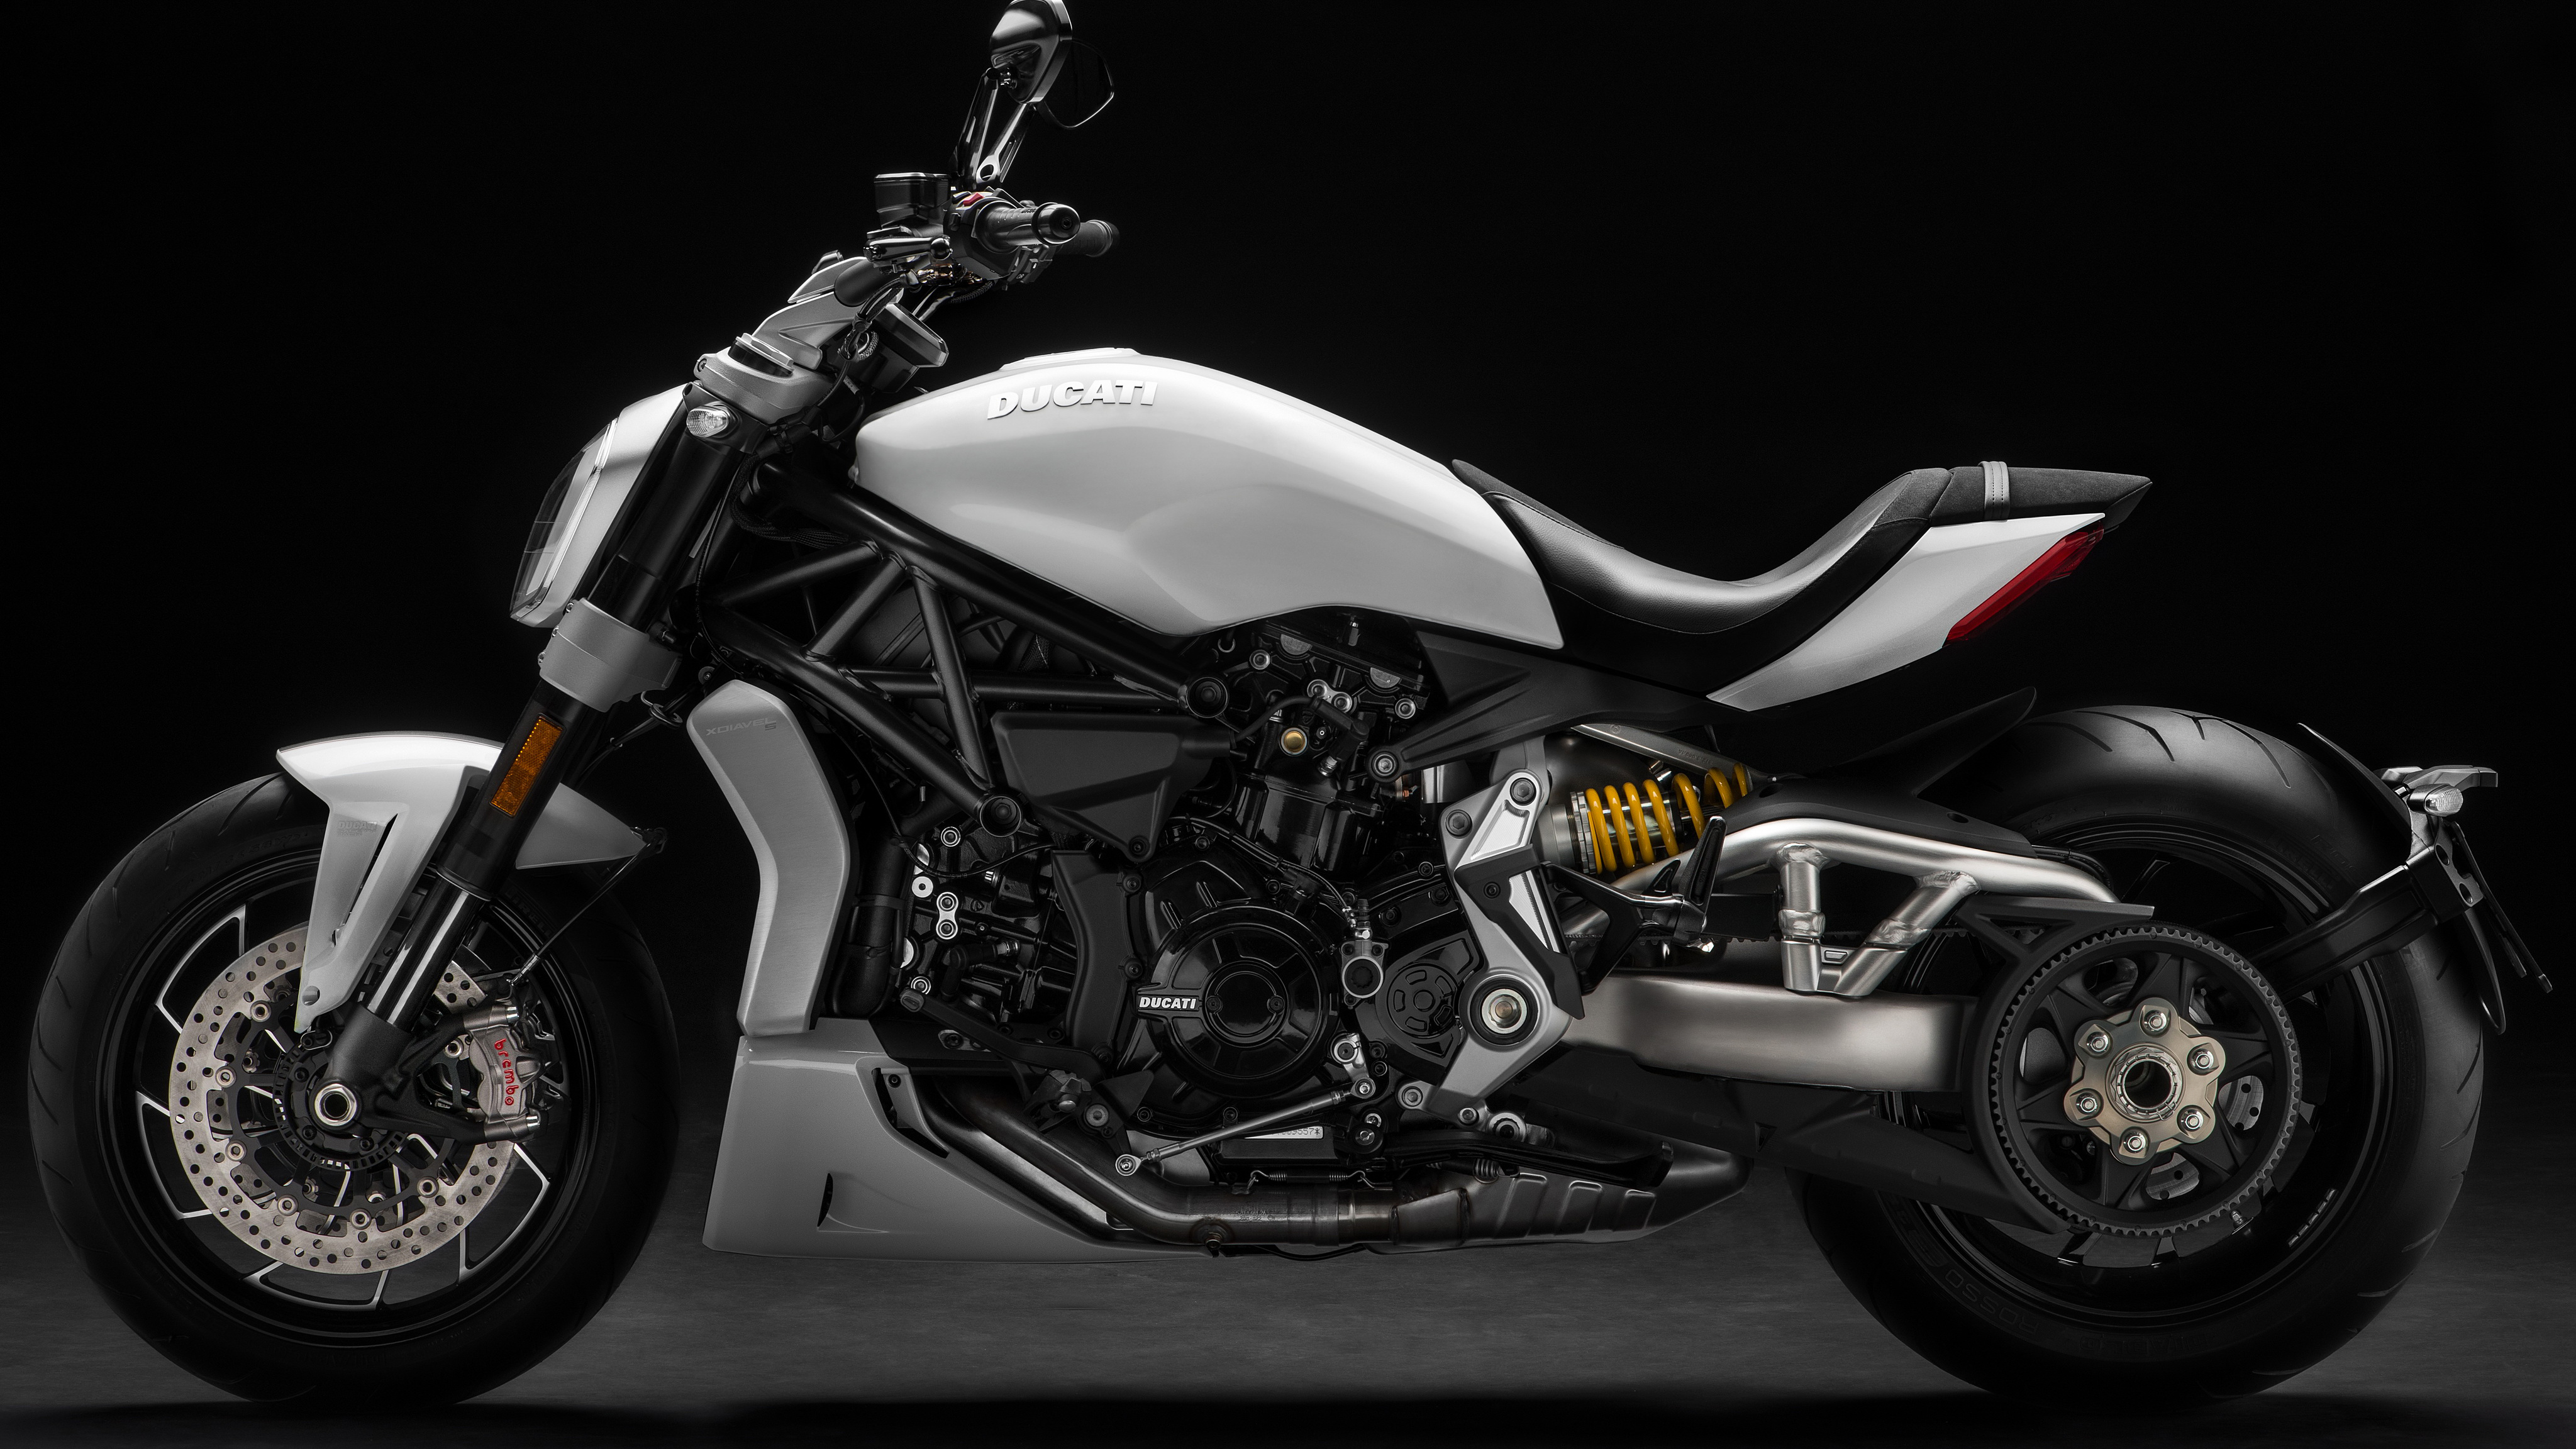 2018 Ducati xdiavel обои скачать